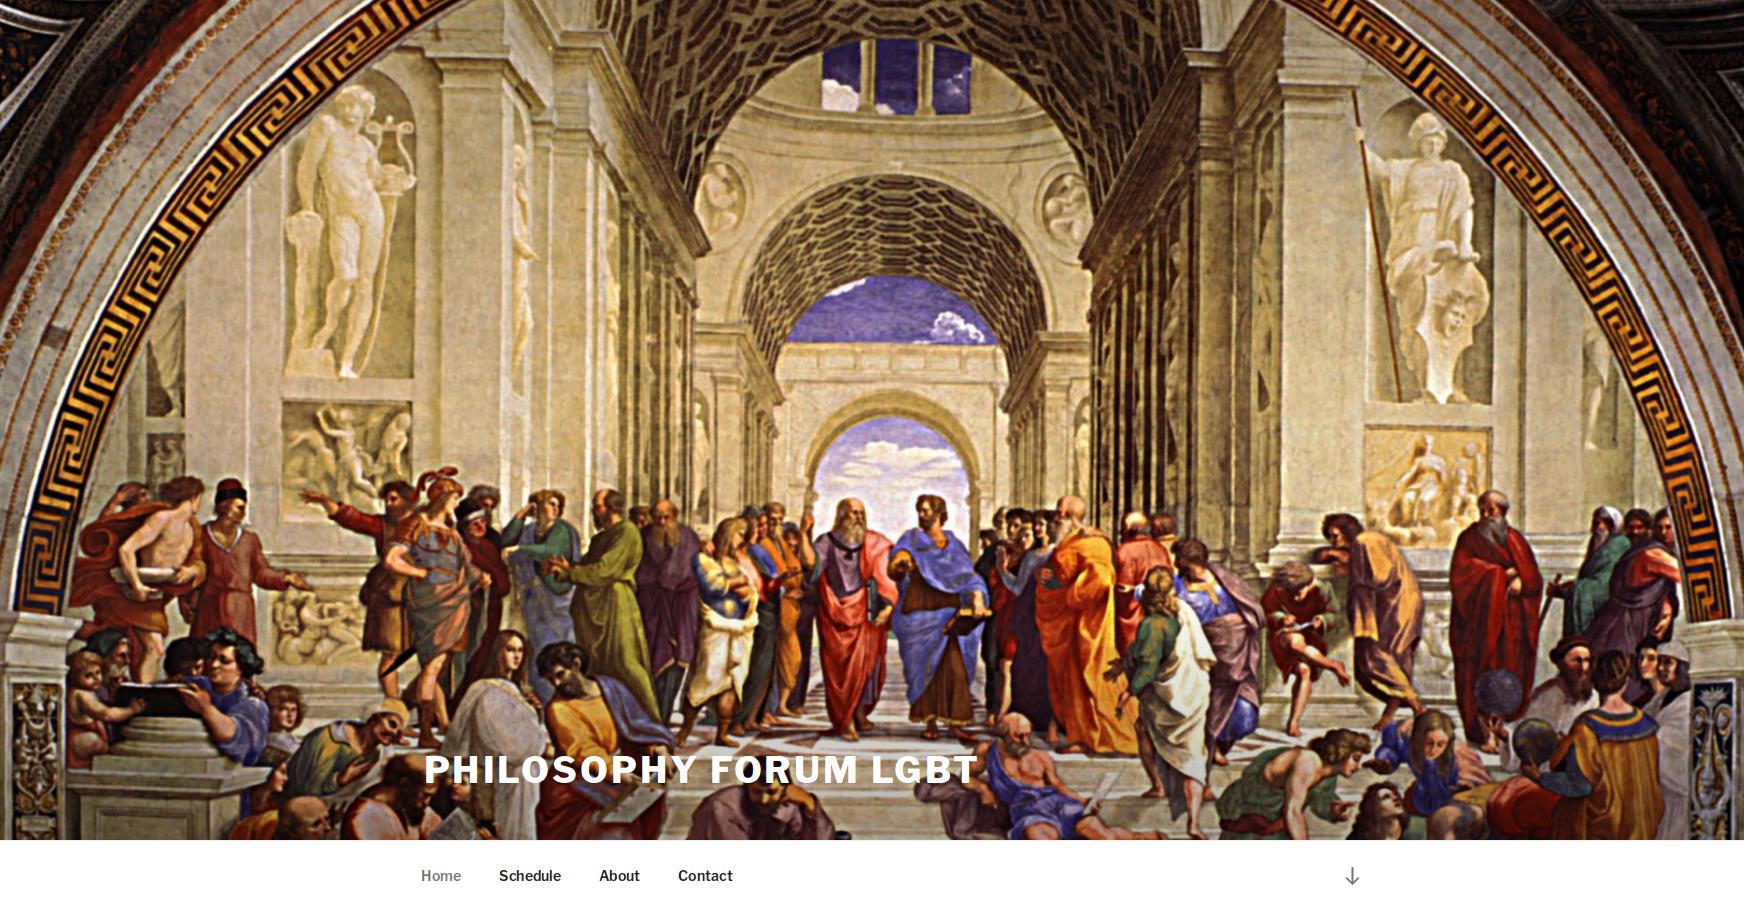 philosophy-forum-LGBT-NYC